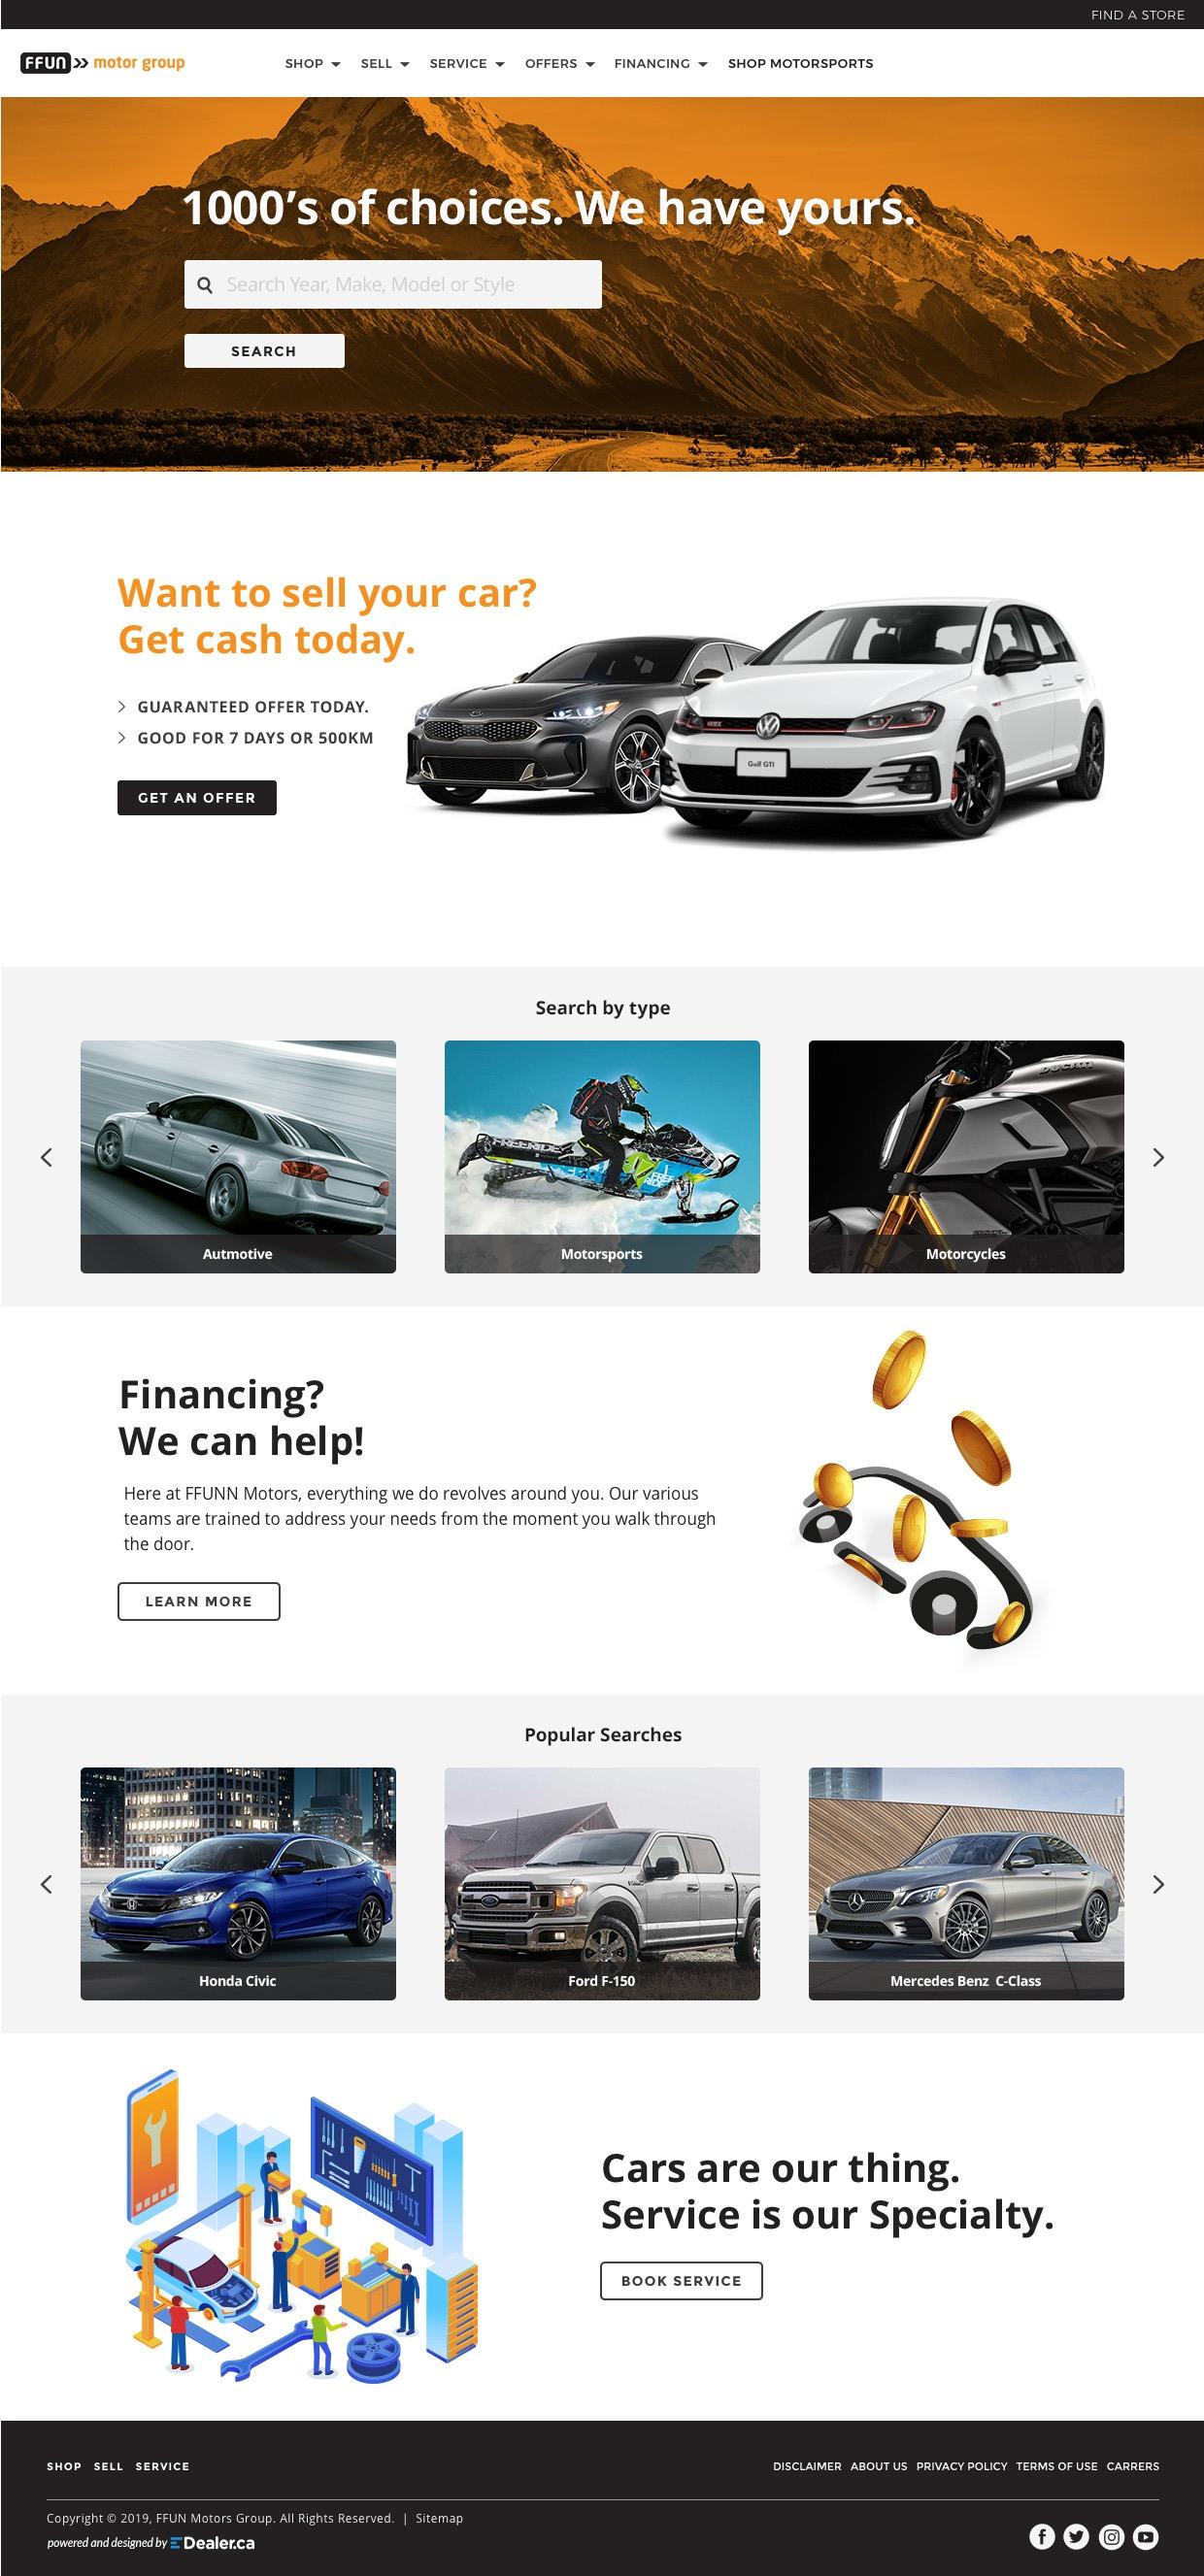 FFUN Motor Group